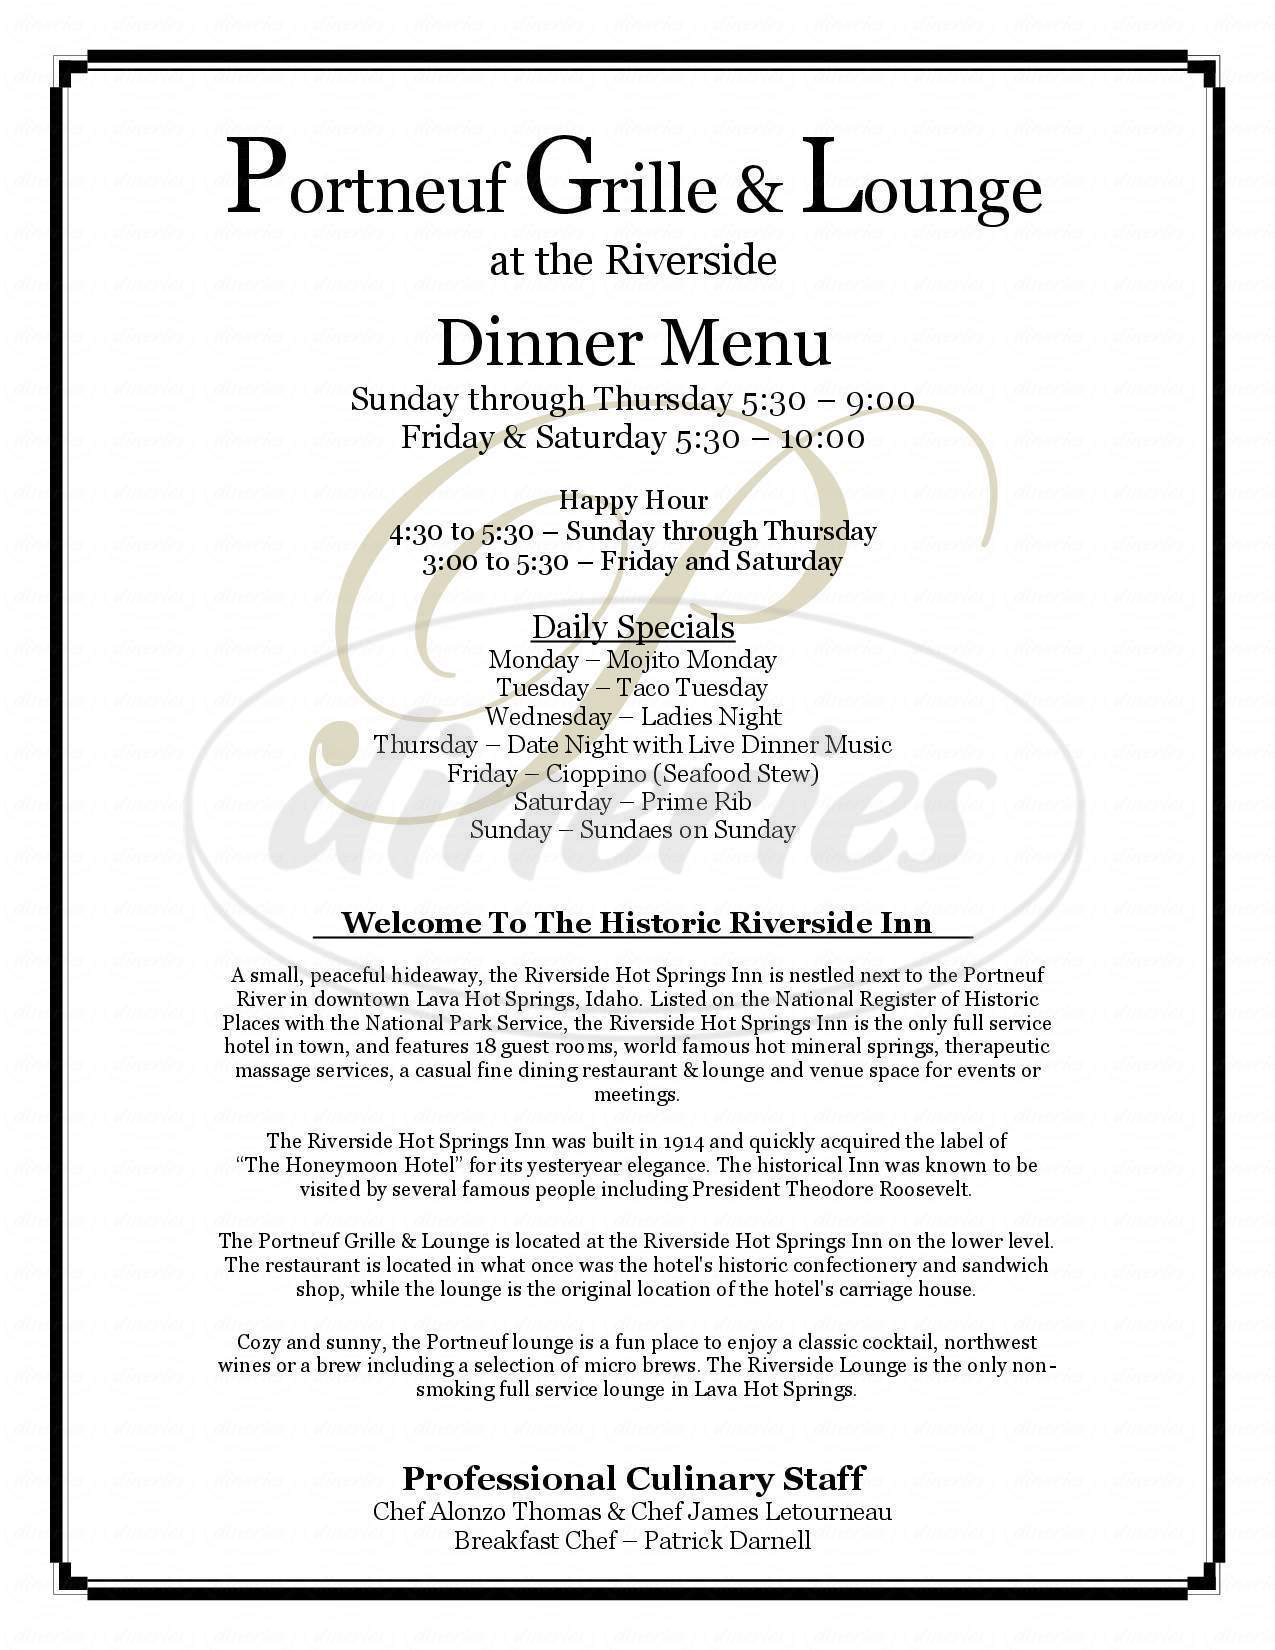 menu for Portneuf Grille & Lounge